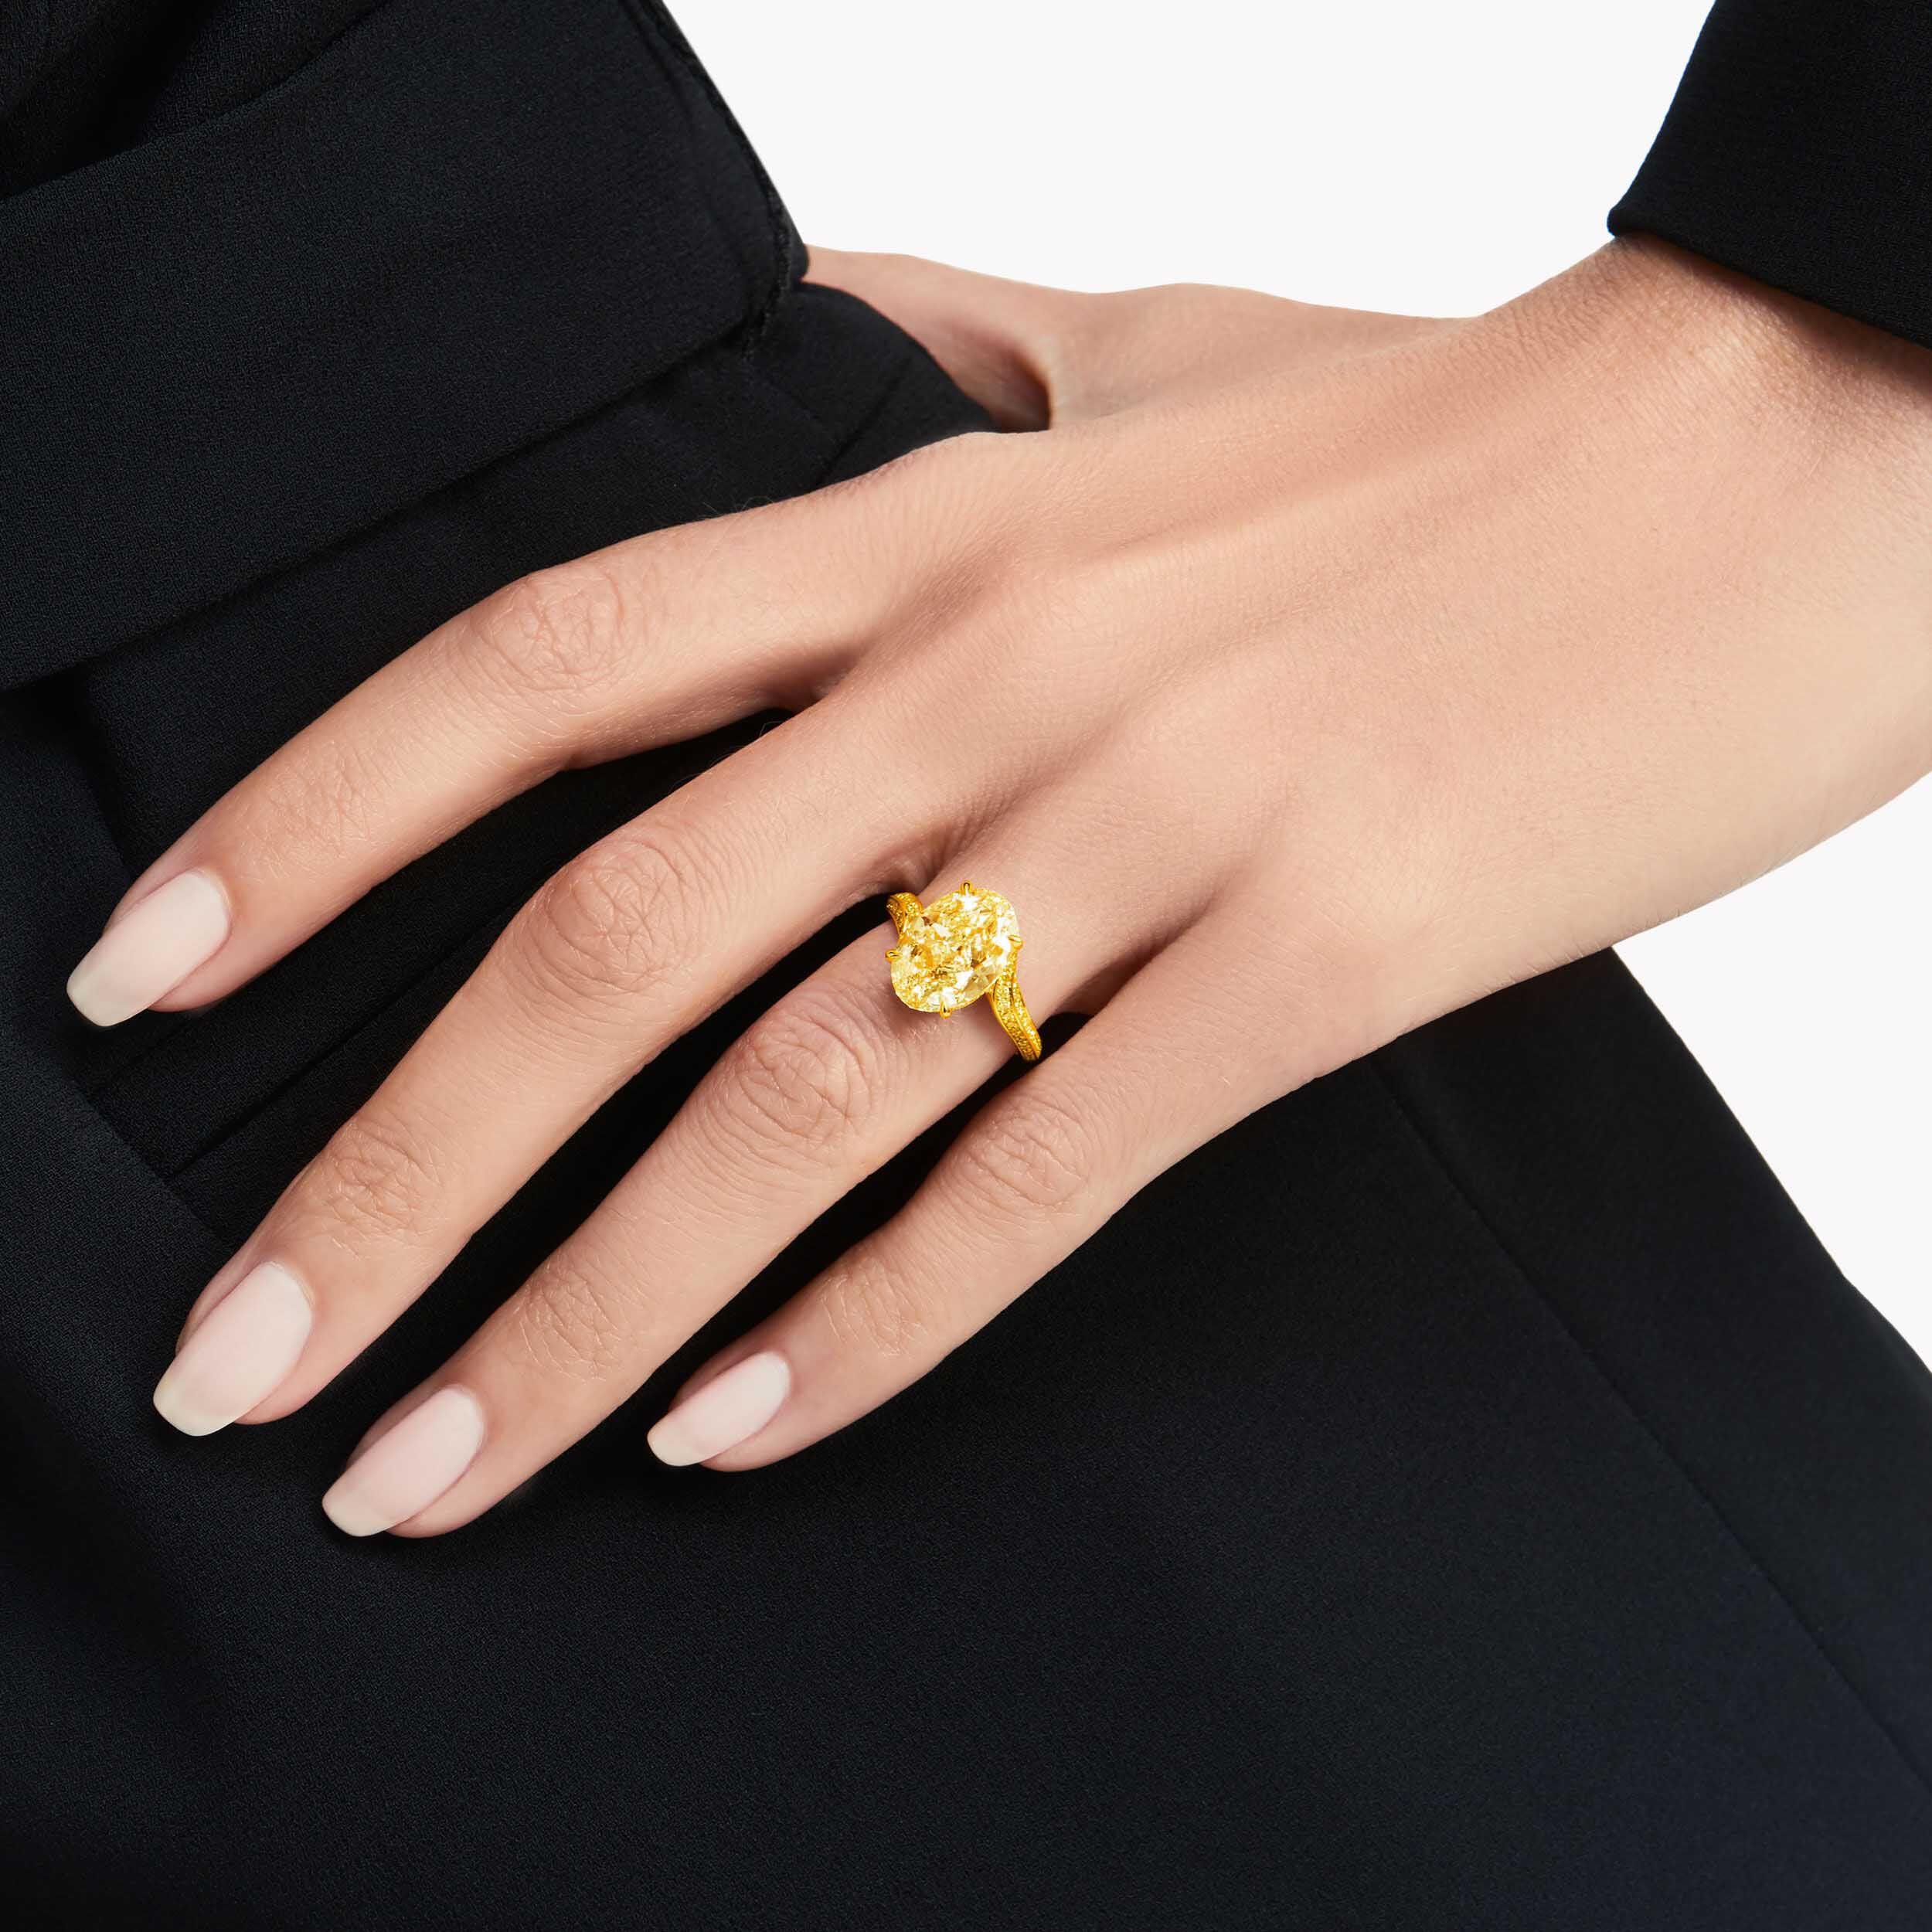 Model wearing a Graff oval yellow diamond ring.